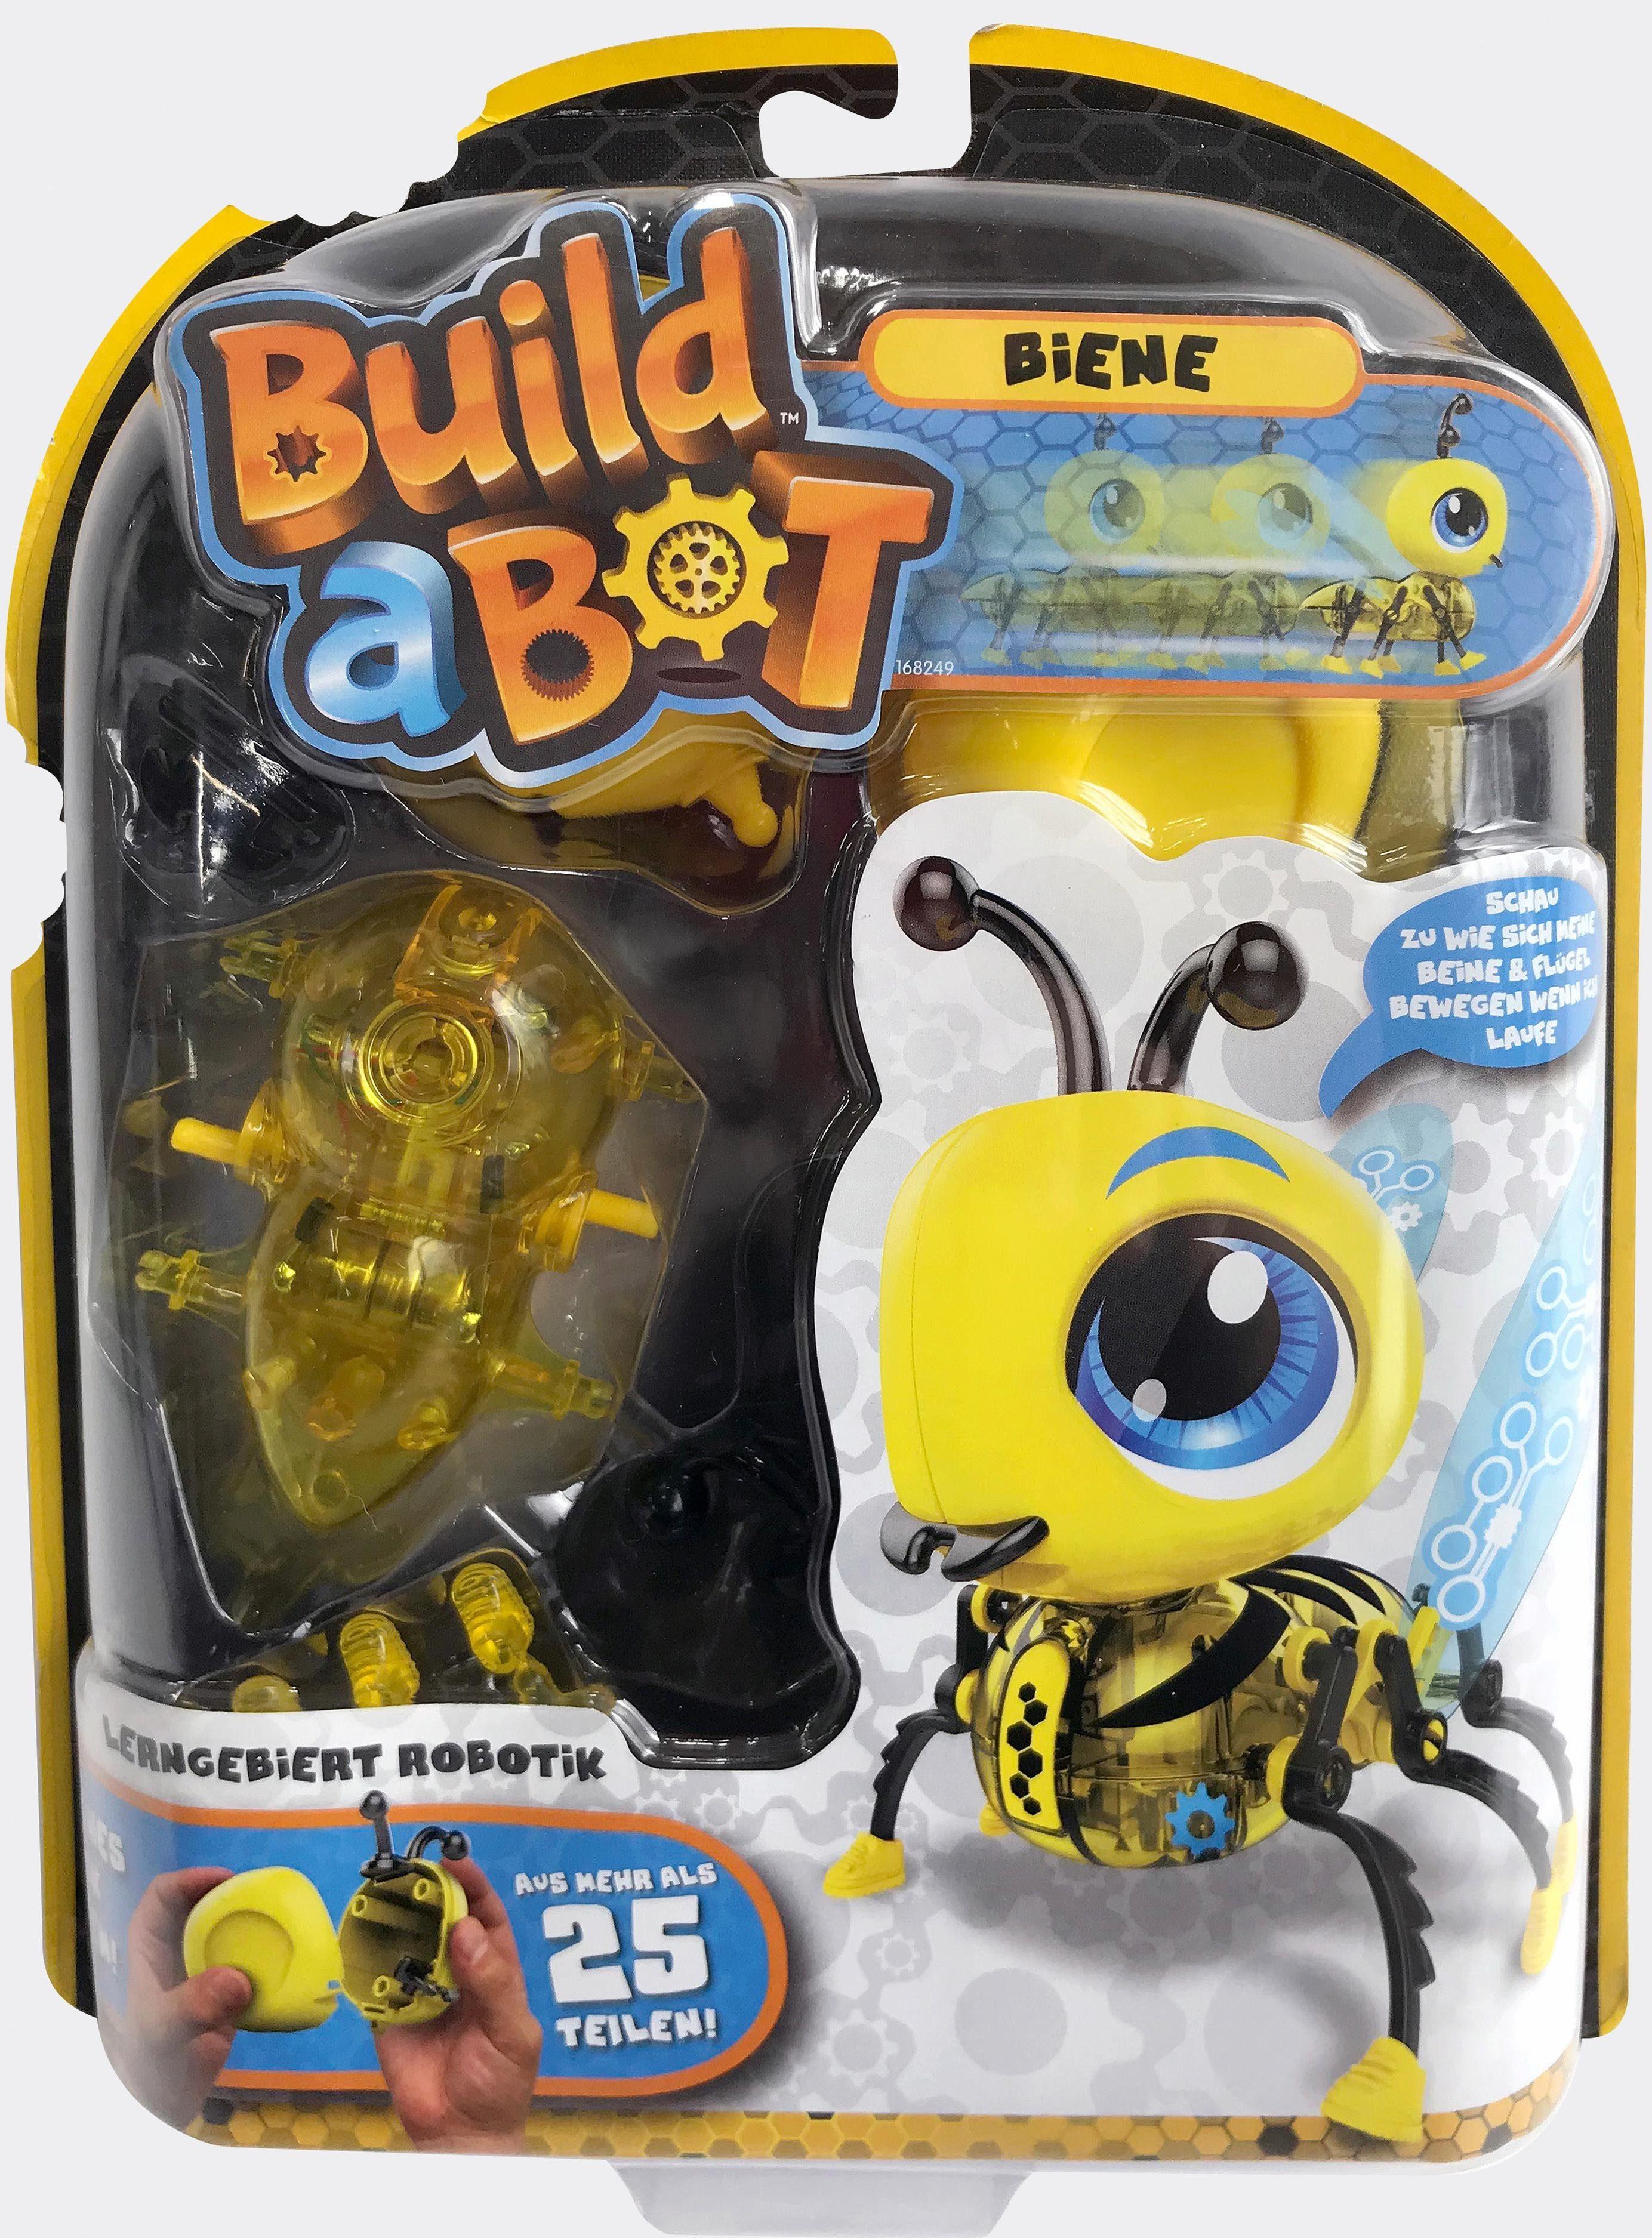 KD Kidz Delight Roboter Baukasten, »Build-A-Bot Biene«